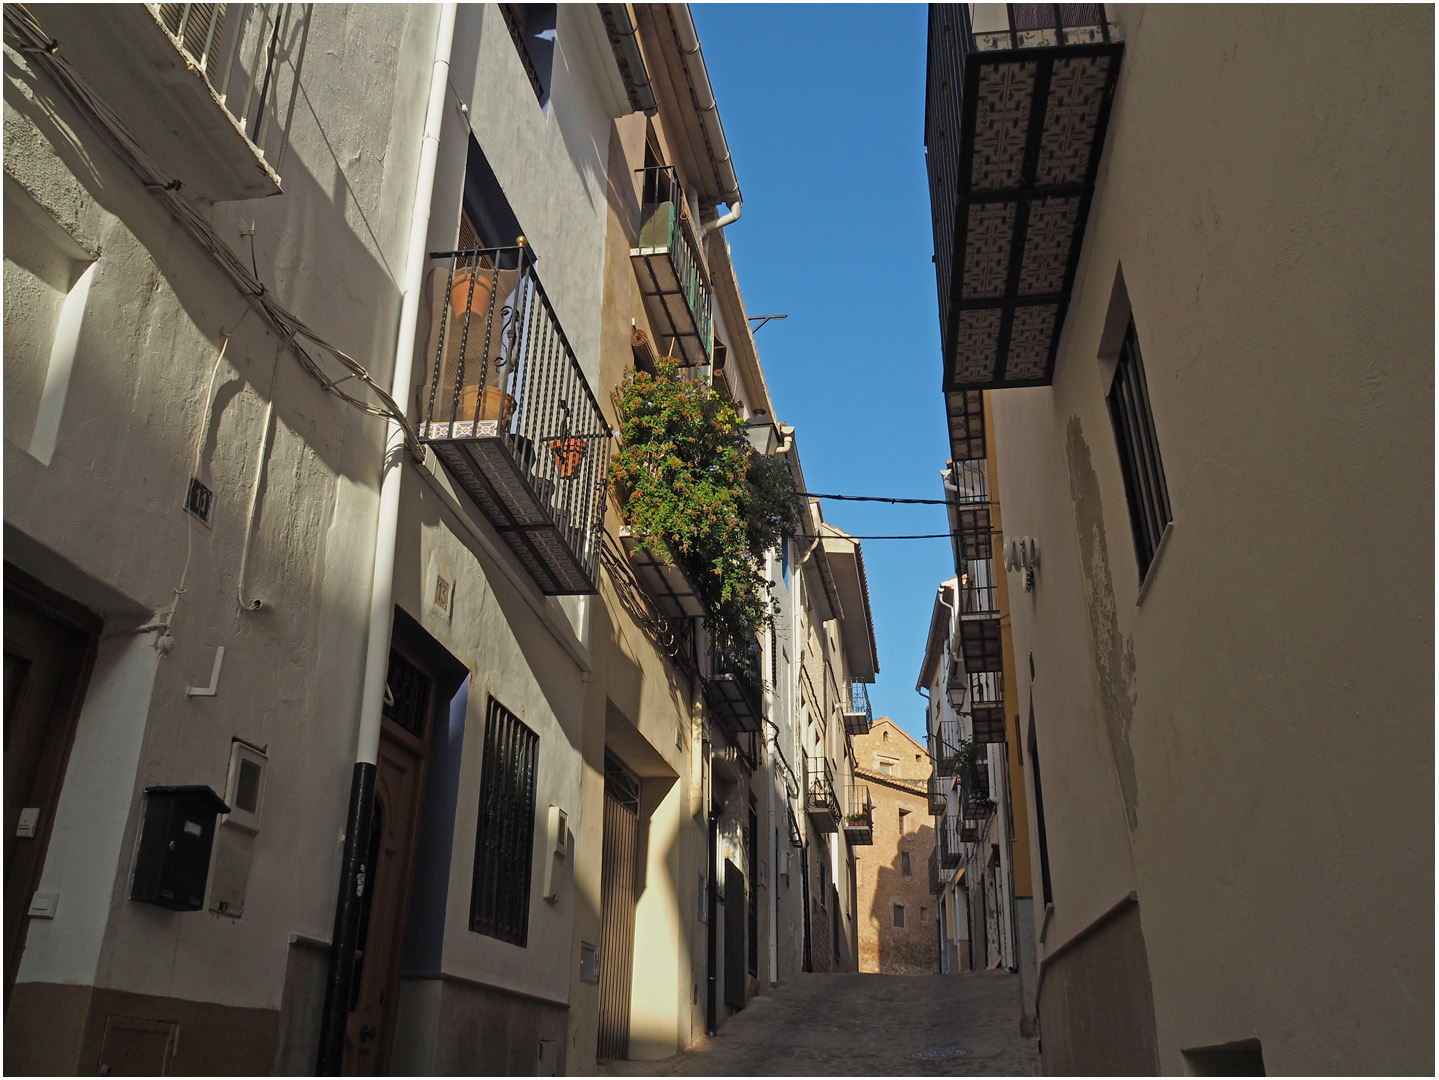 Une rue de la vieille ville  --  Segorbe